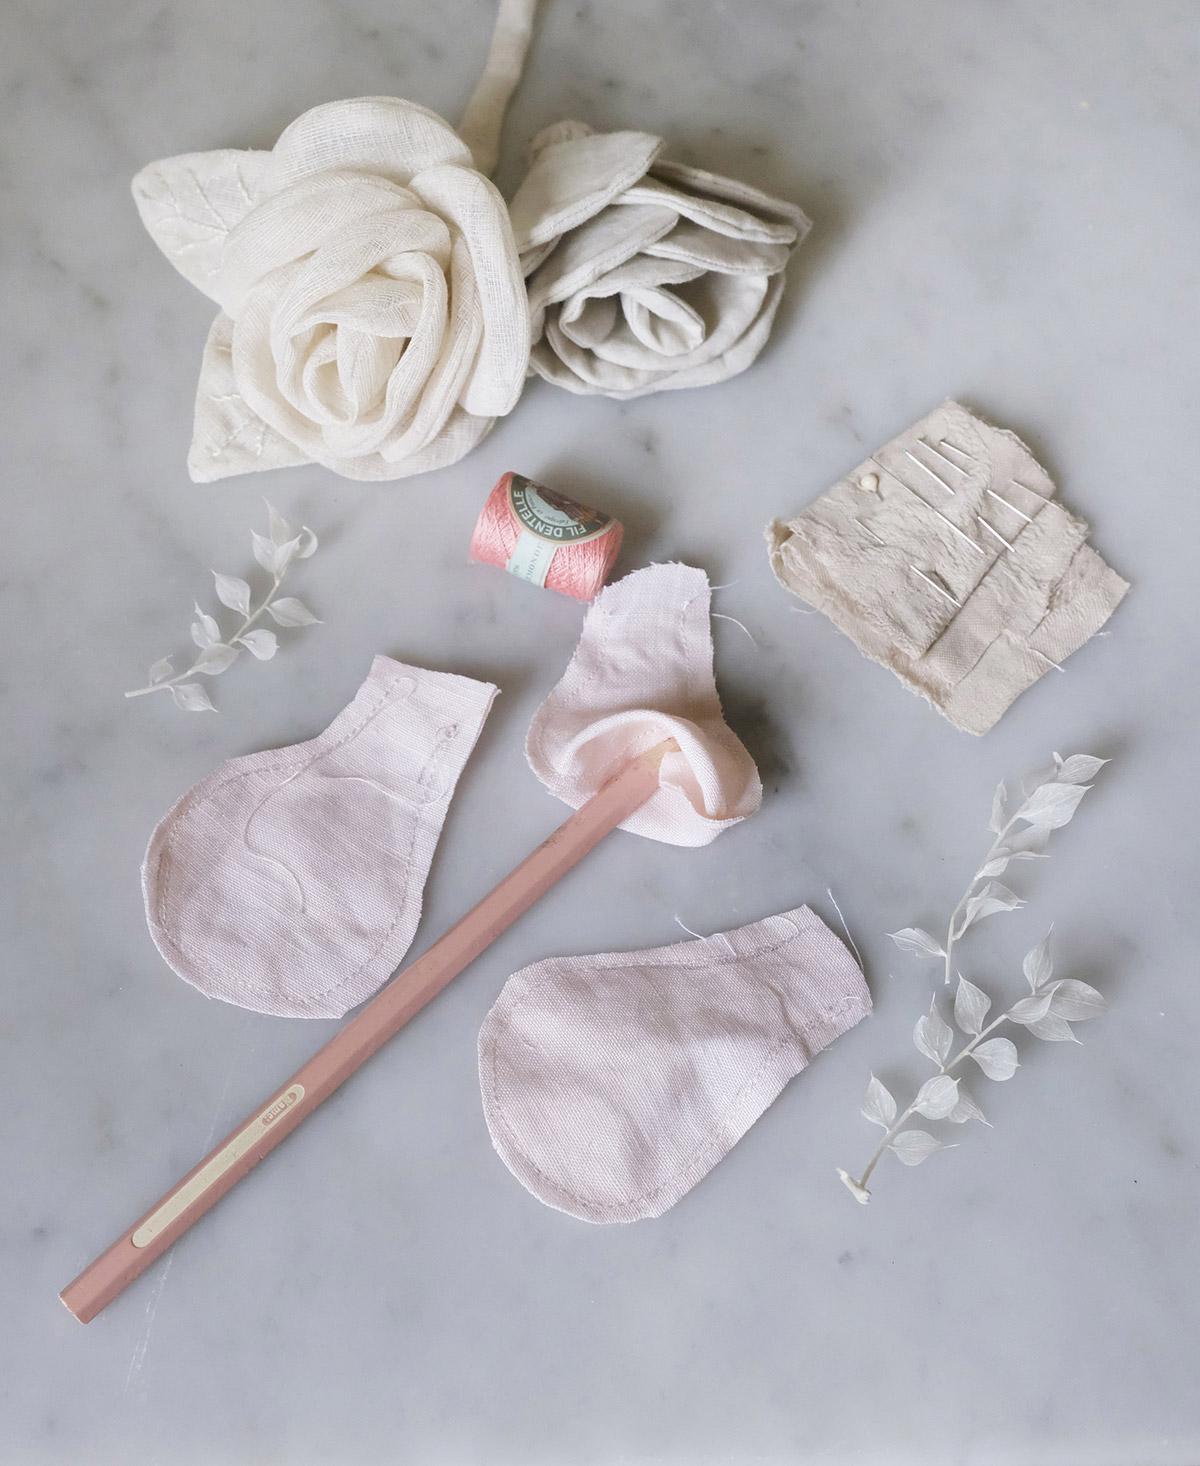 Tutorial Blanc MariClo' - Sbocciano le rose - step 3